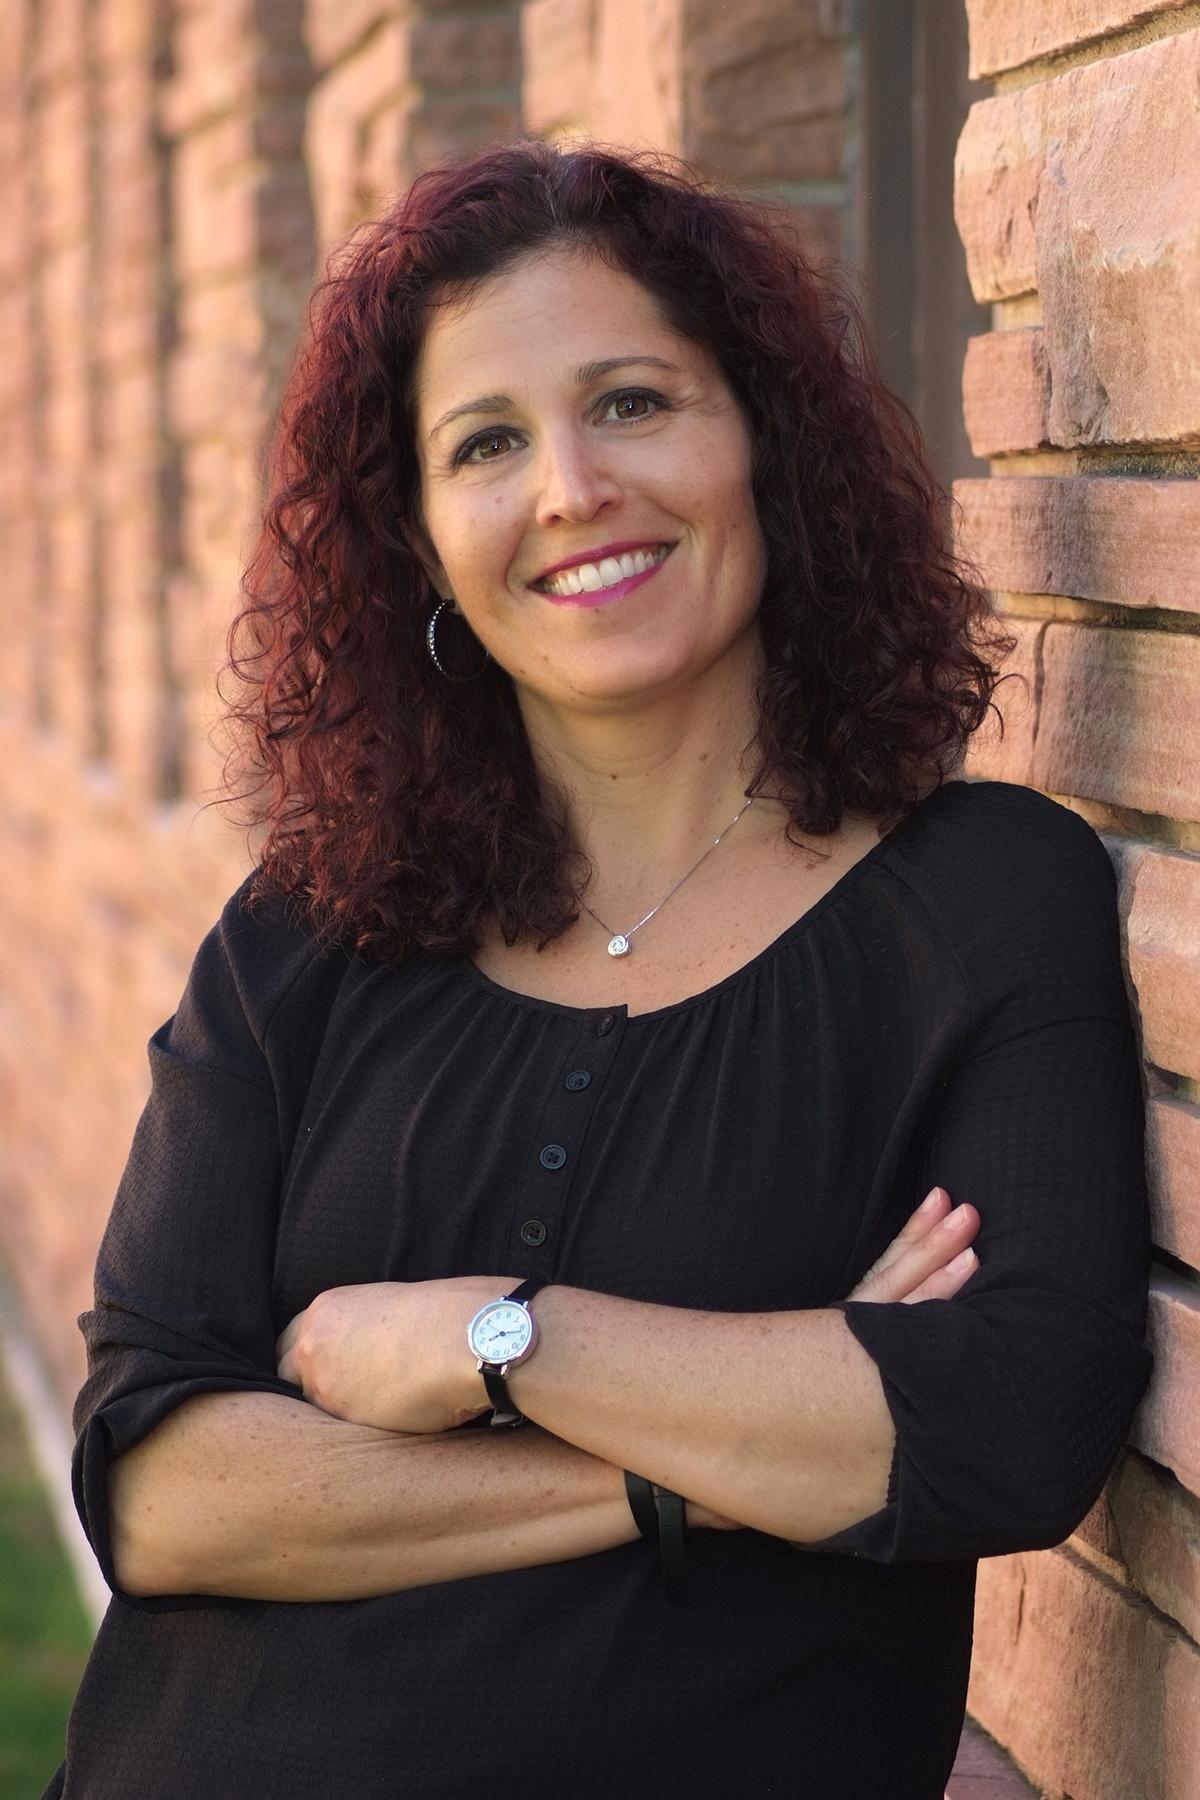 Sarah Brown, Director of Adult Engagement